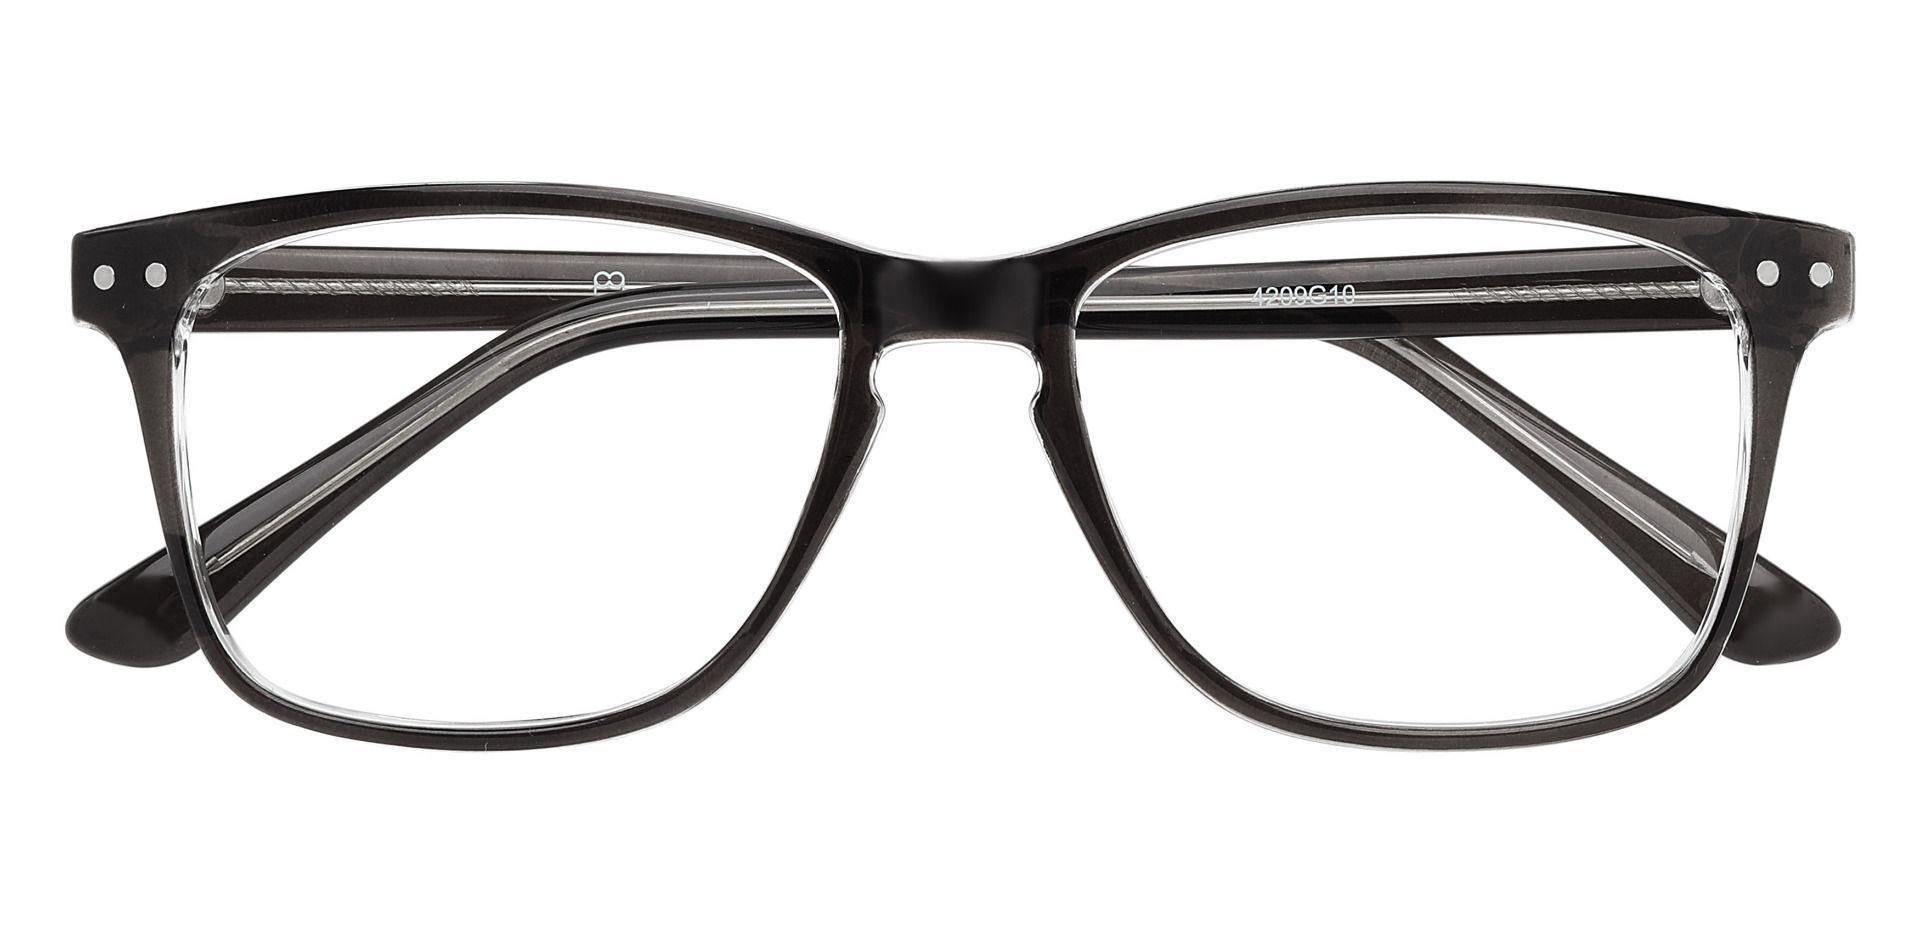 Hope Oval Eyeglasses Frame - Black